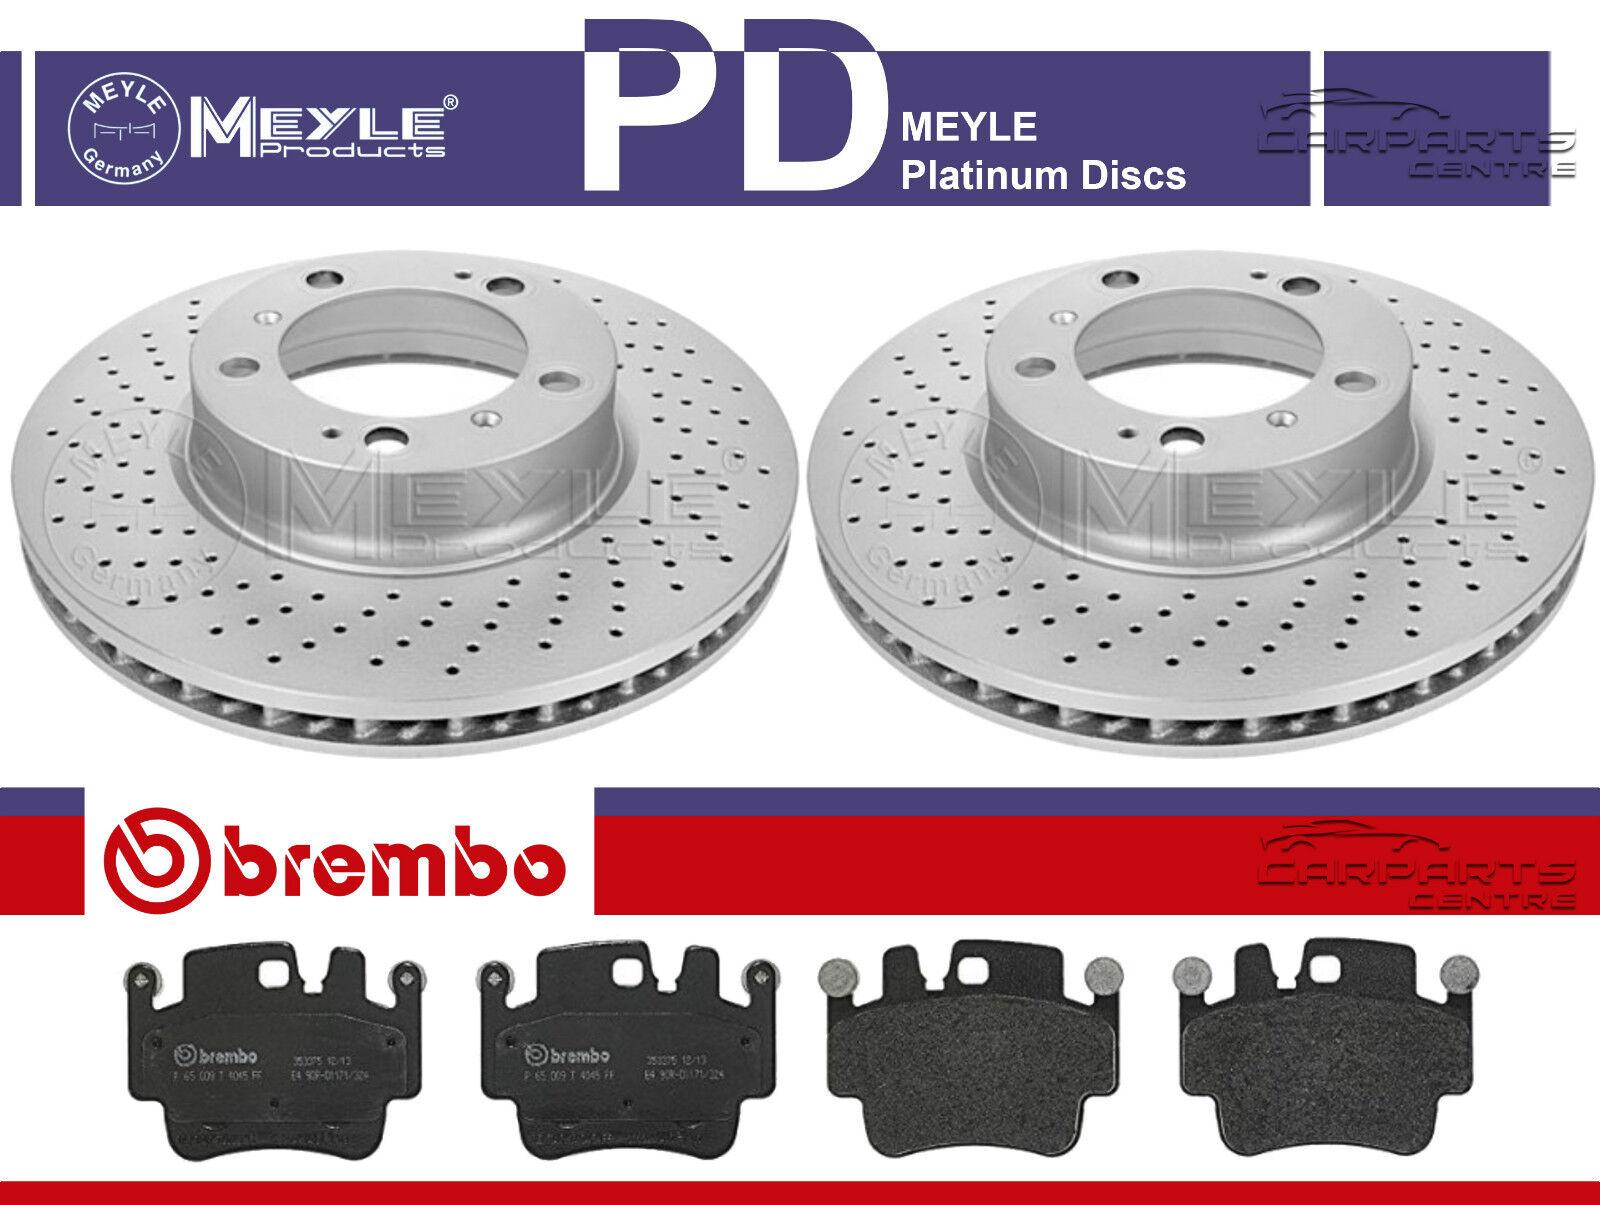 FOR PORSCHE BOXSTER CAYMAN REAR GENUINE CROSS DRILLED BREMBO BRAKE DISCS 299mm